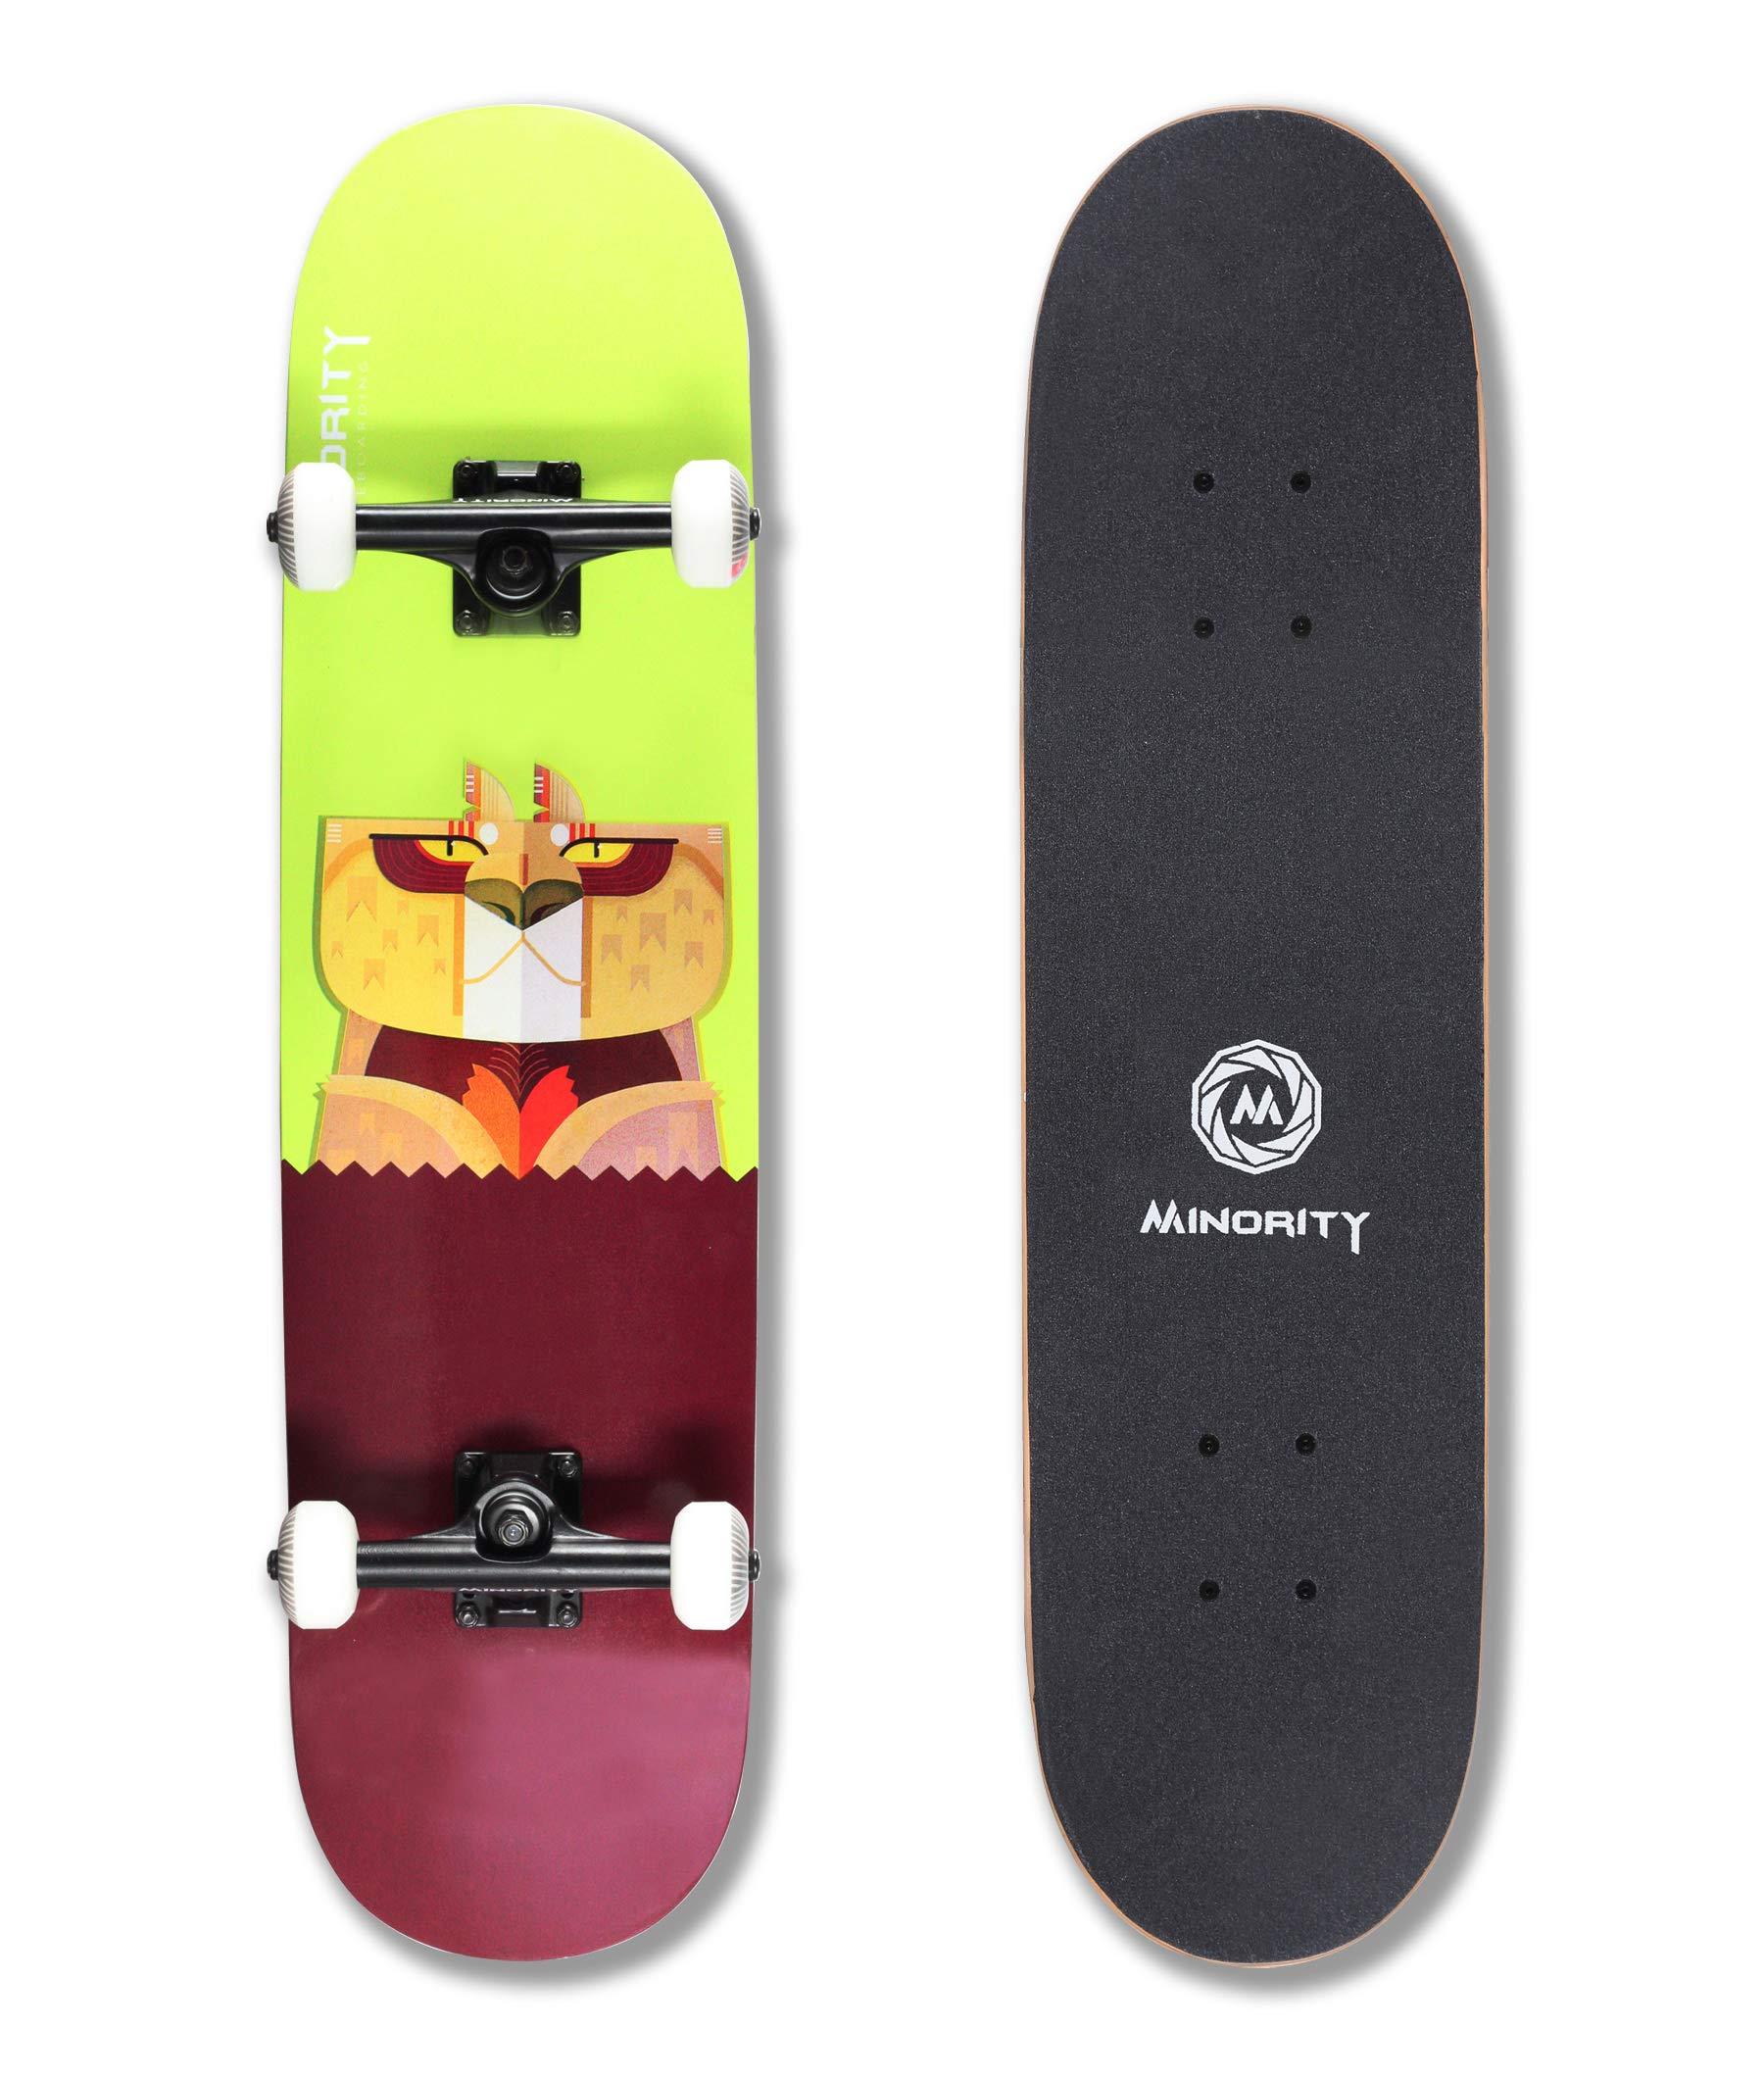 MINORITY 32inch Maple Skateboard (Cheetah)